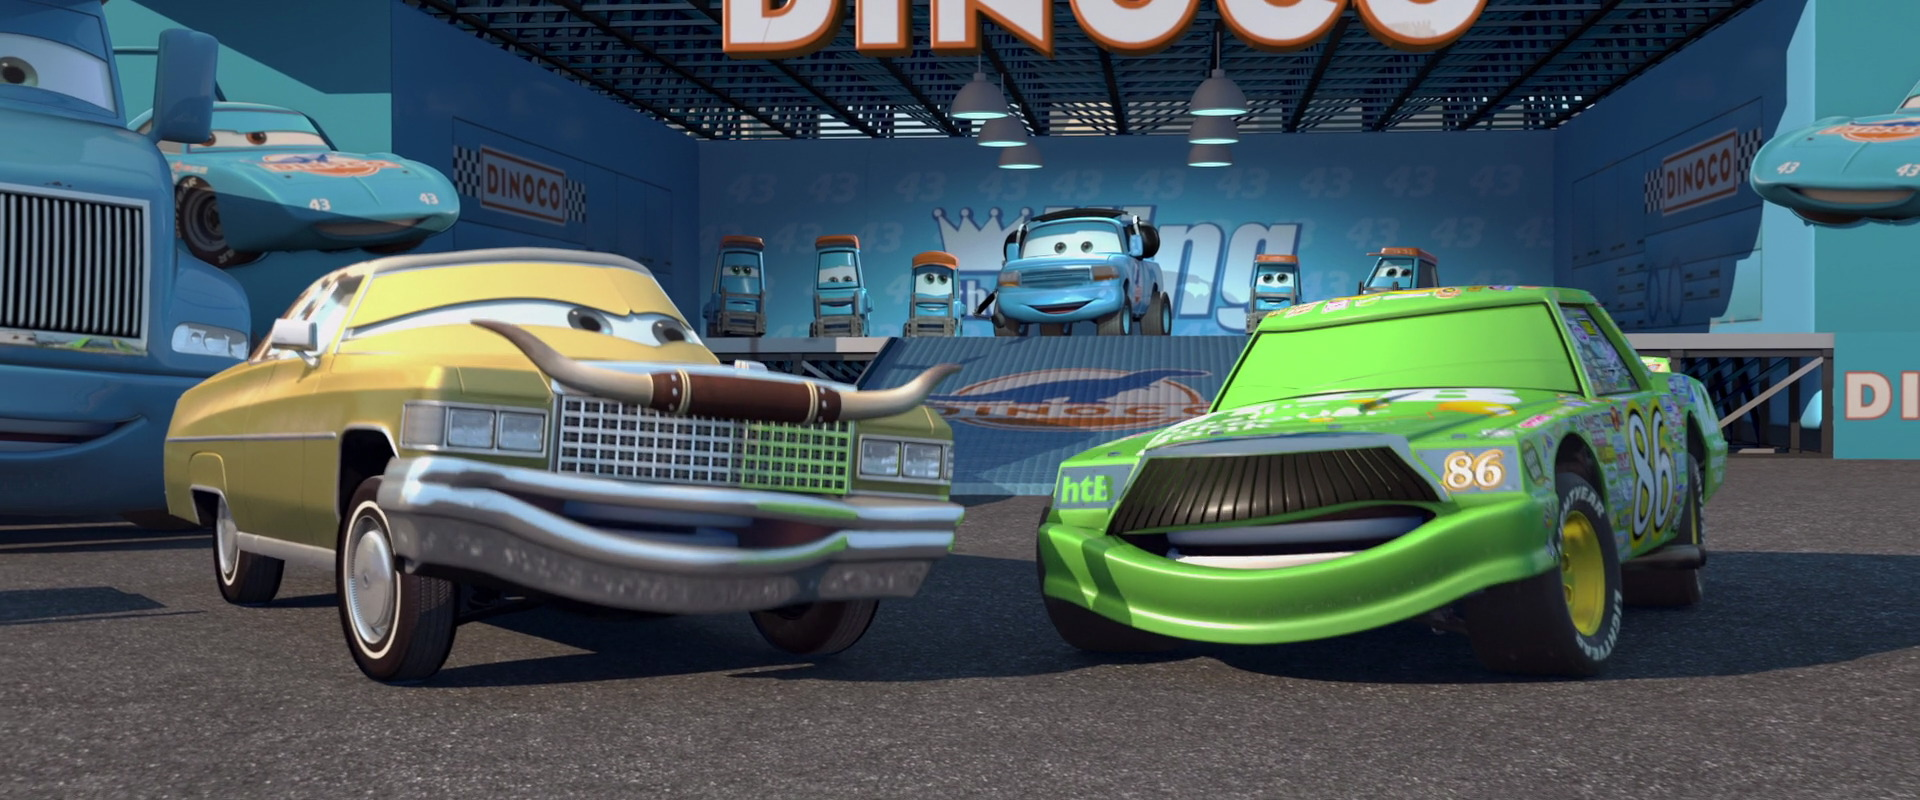 tex-dinoco-personnage-cars-01